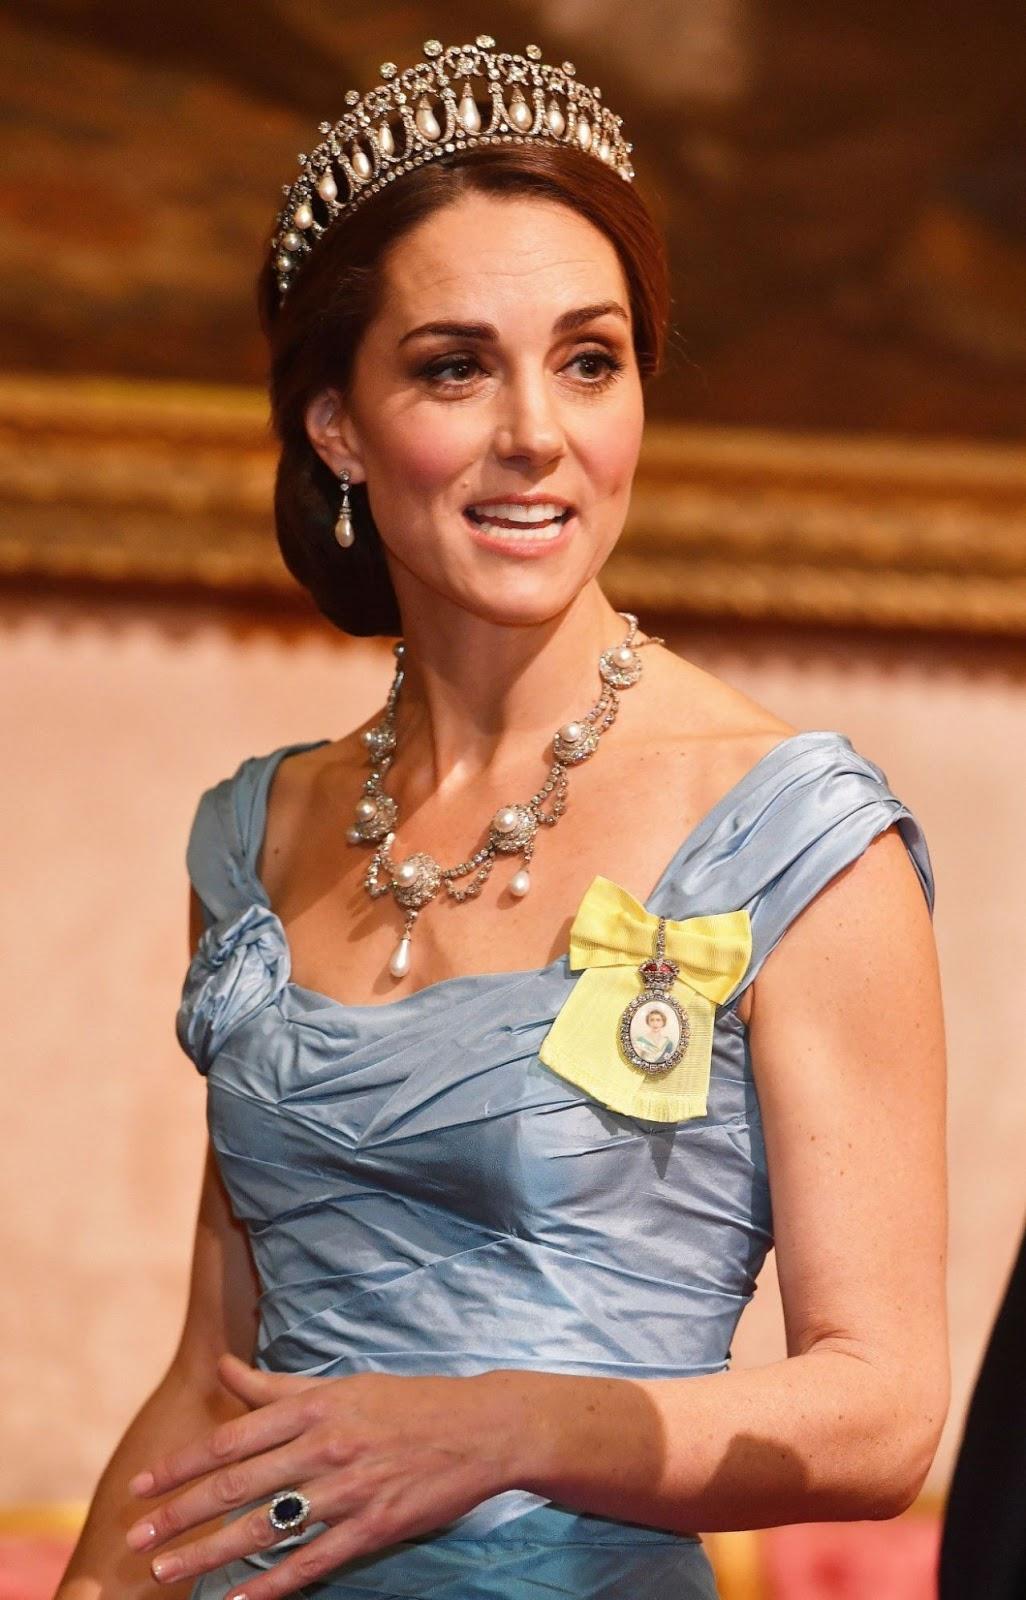 Catherine, Duchess of Cambridge Attends the Secretary of